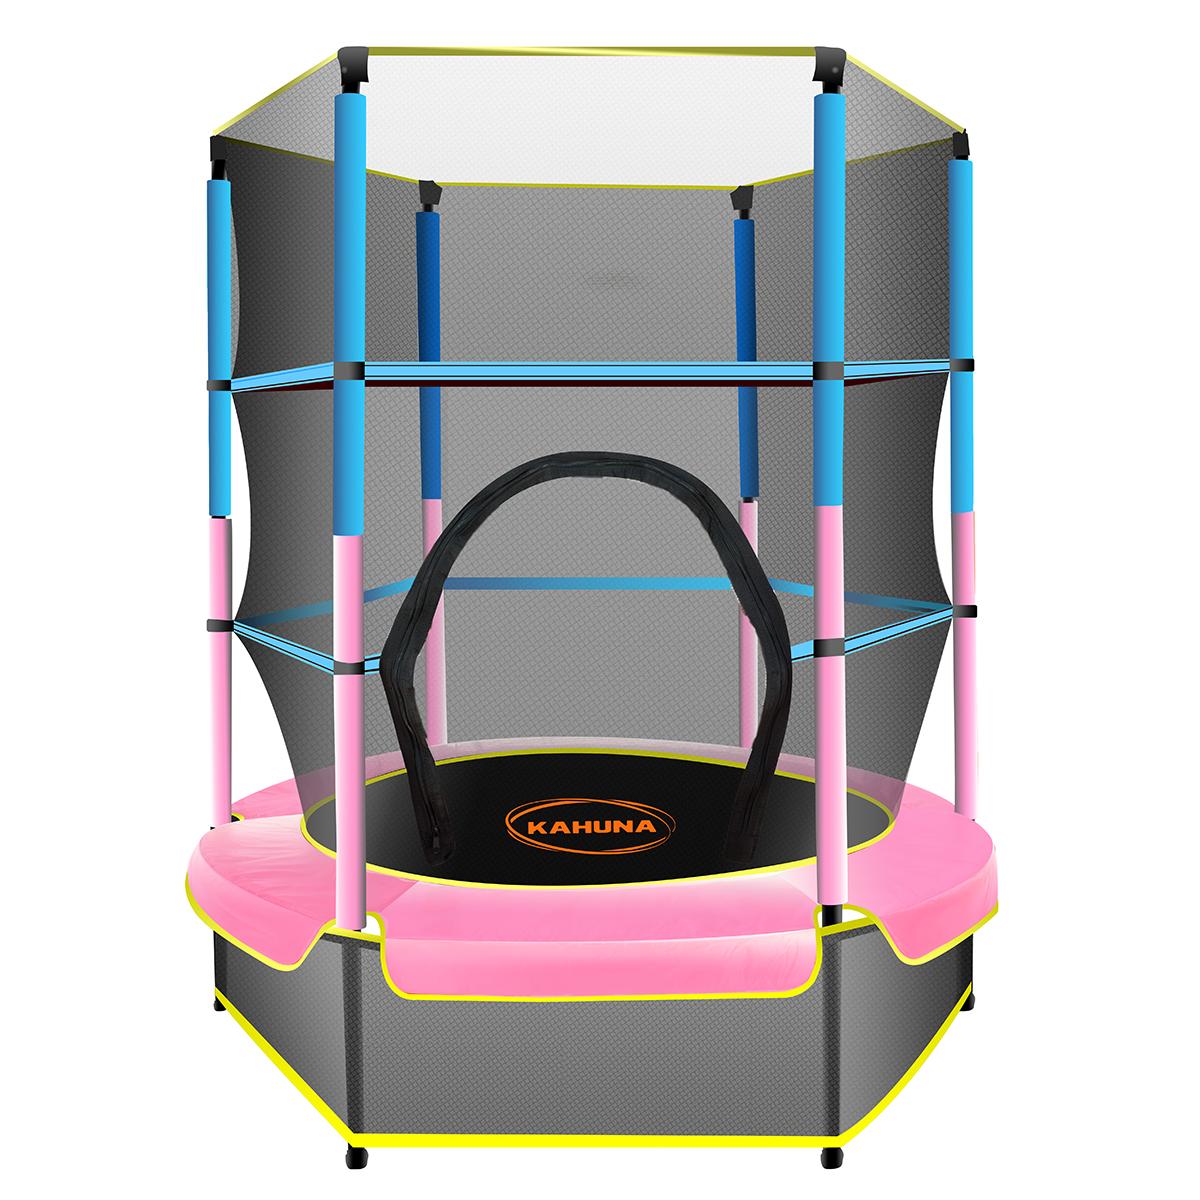 Kahuna Mini 4.5ft Trampoline Blue Pink